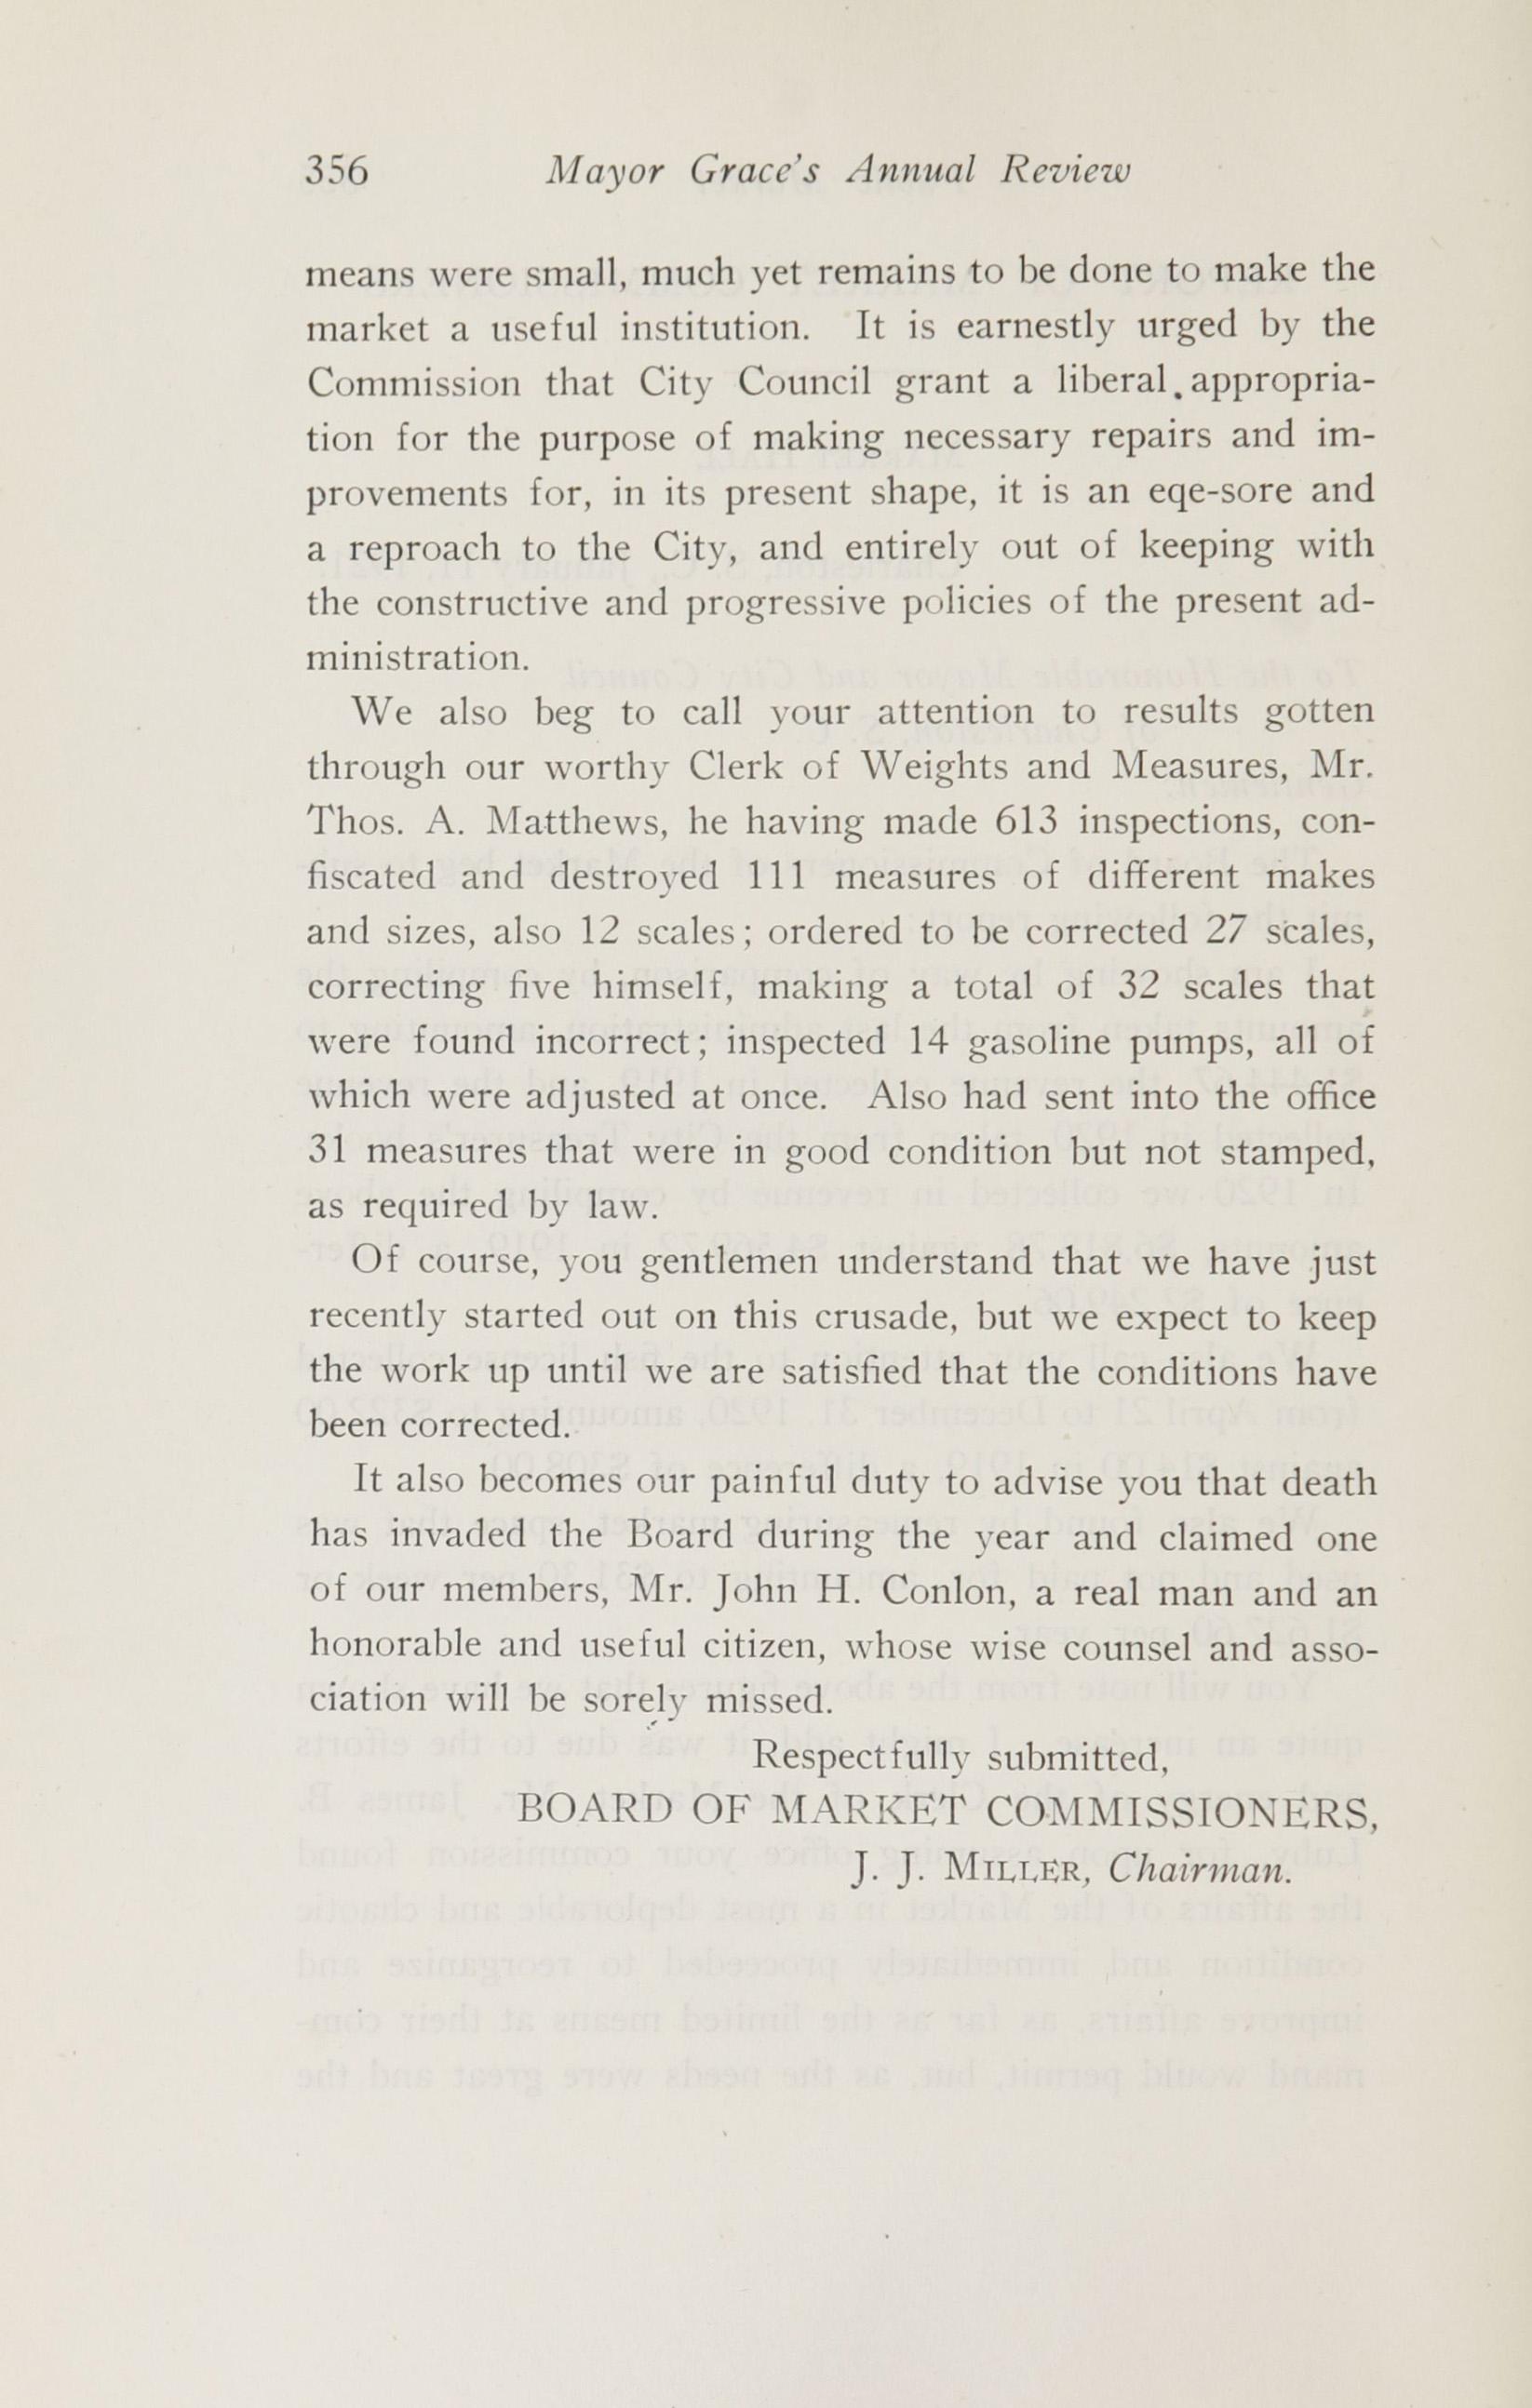 Charleston Yearbook, 1920, page 356